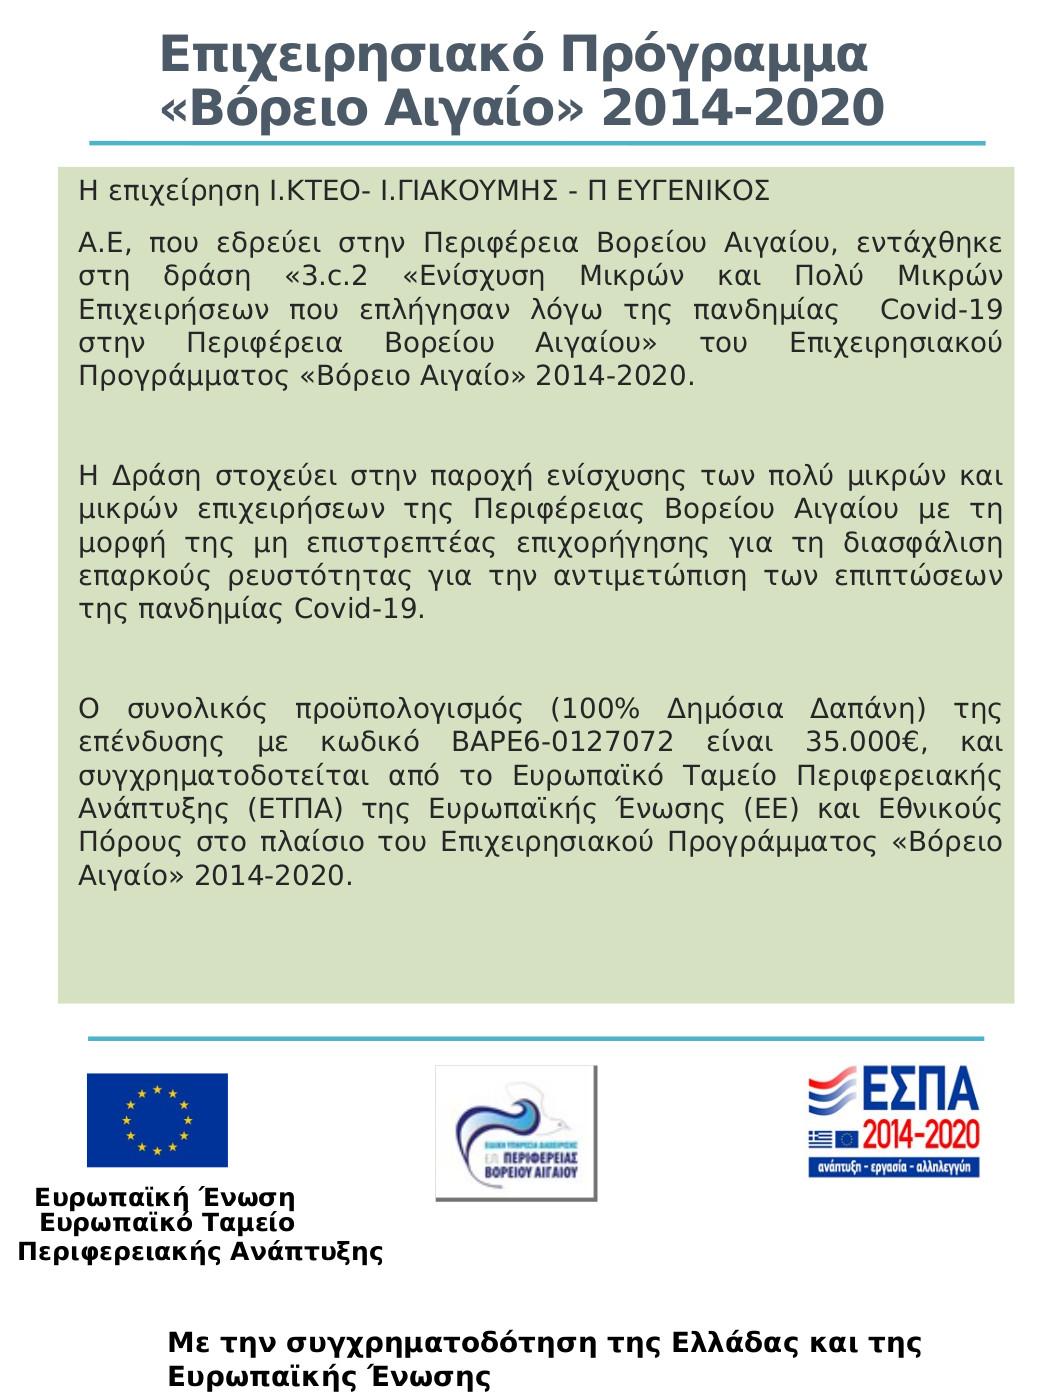 IKTEO XIOY - Ενίσχυση Μικρών και Πολύ Μικρών Επιχειρήσεων που επλήγησαν λόγω της πανδημίας Covid-19 στην Περιφέρεια Βορείου Αιγαίου